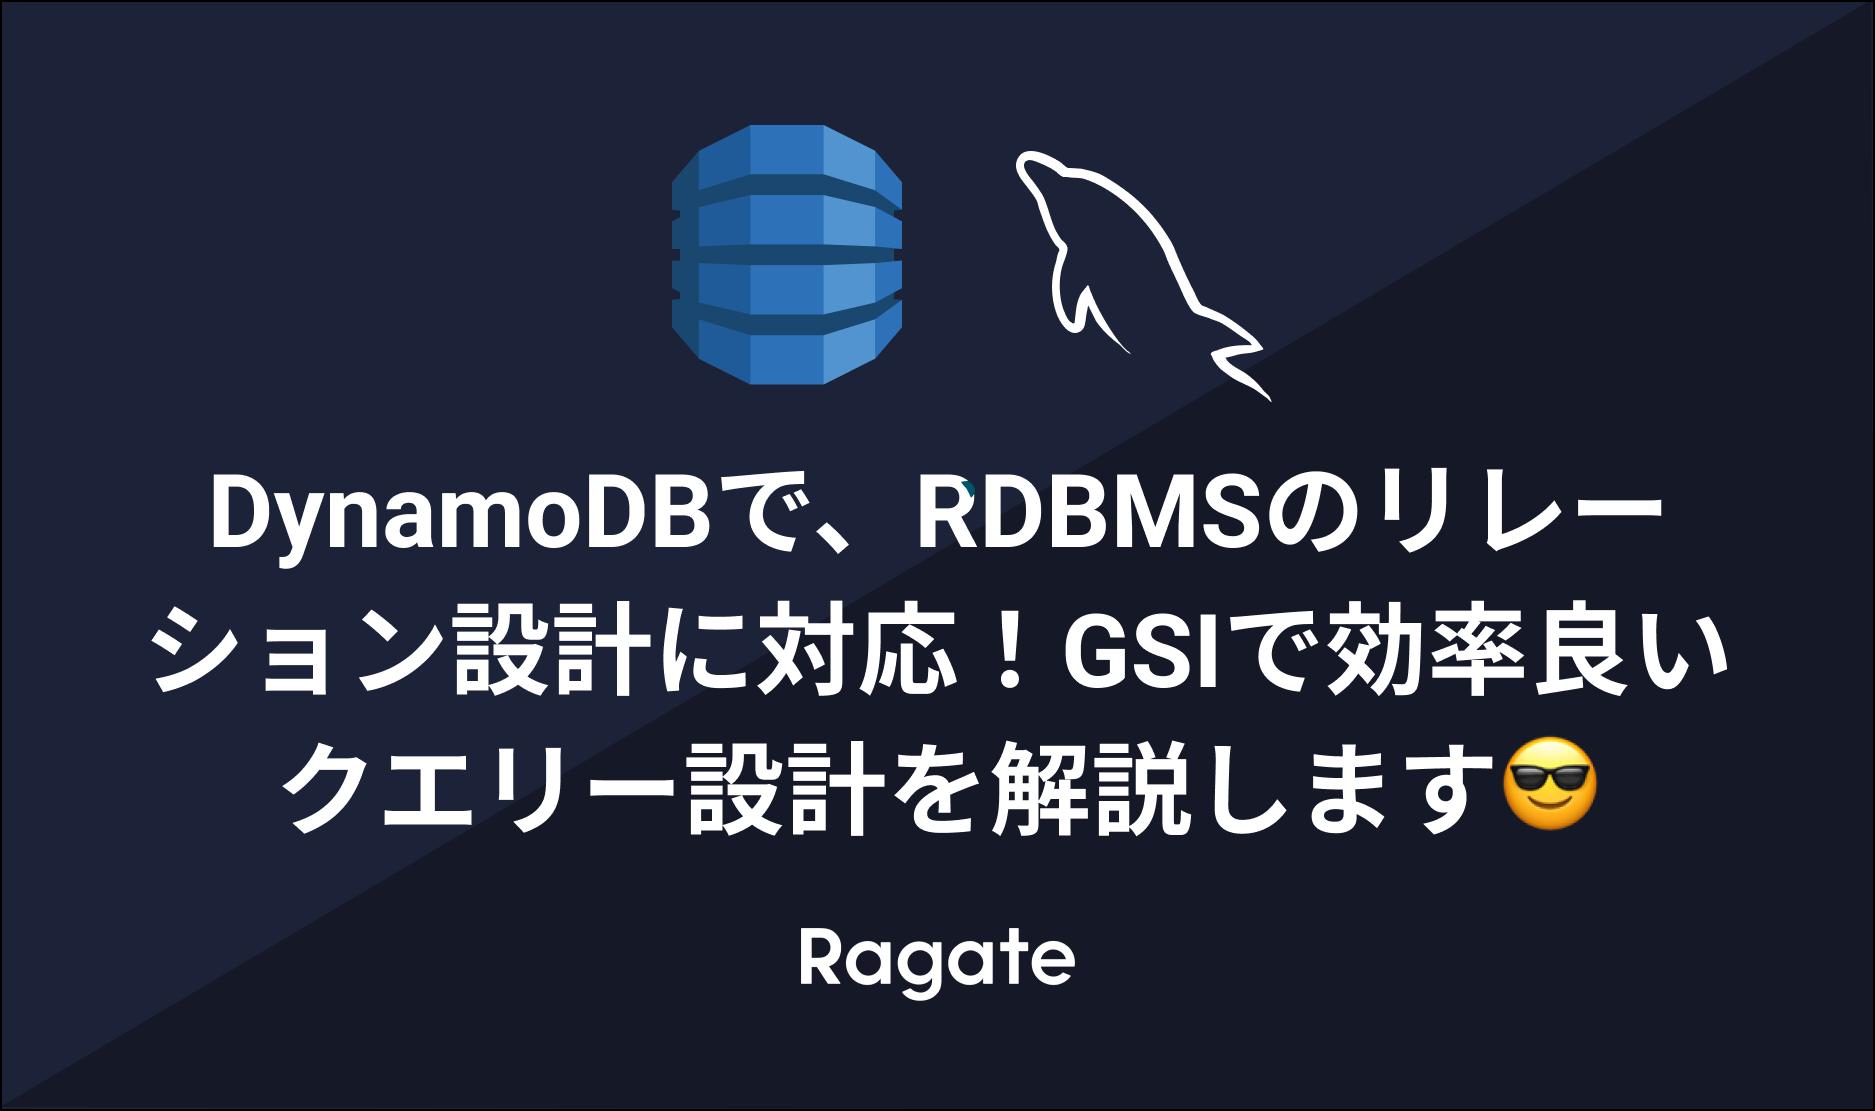 DynamoDBで、RDBMSのリレーション設計に対応!GSIで効率良いクエリー設計を解説します😎